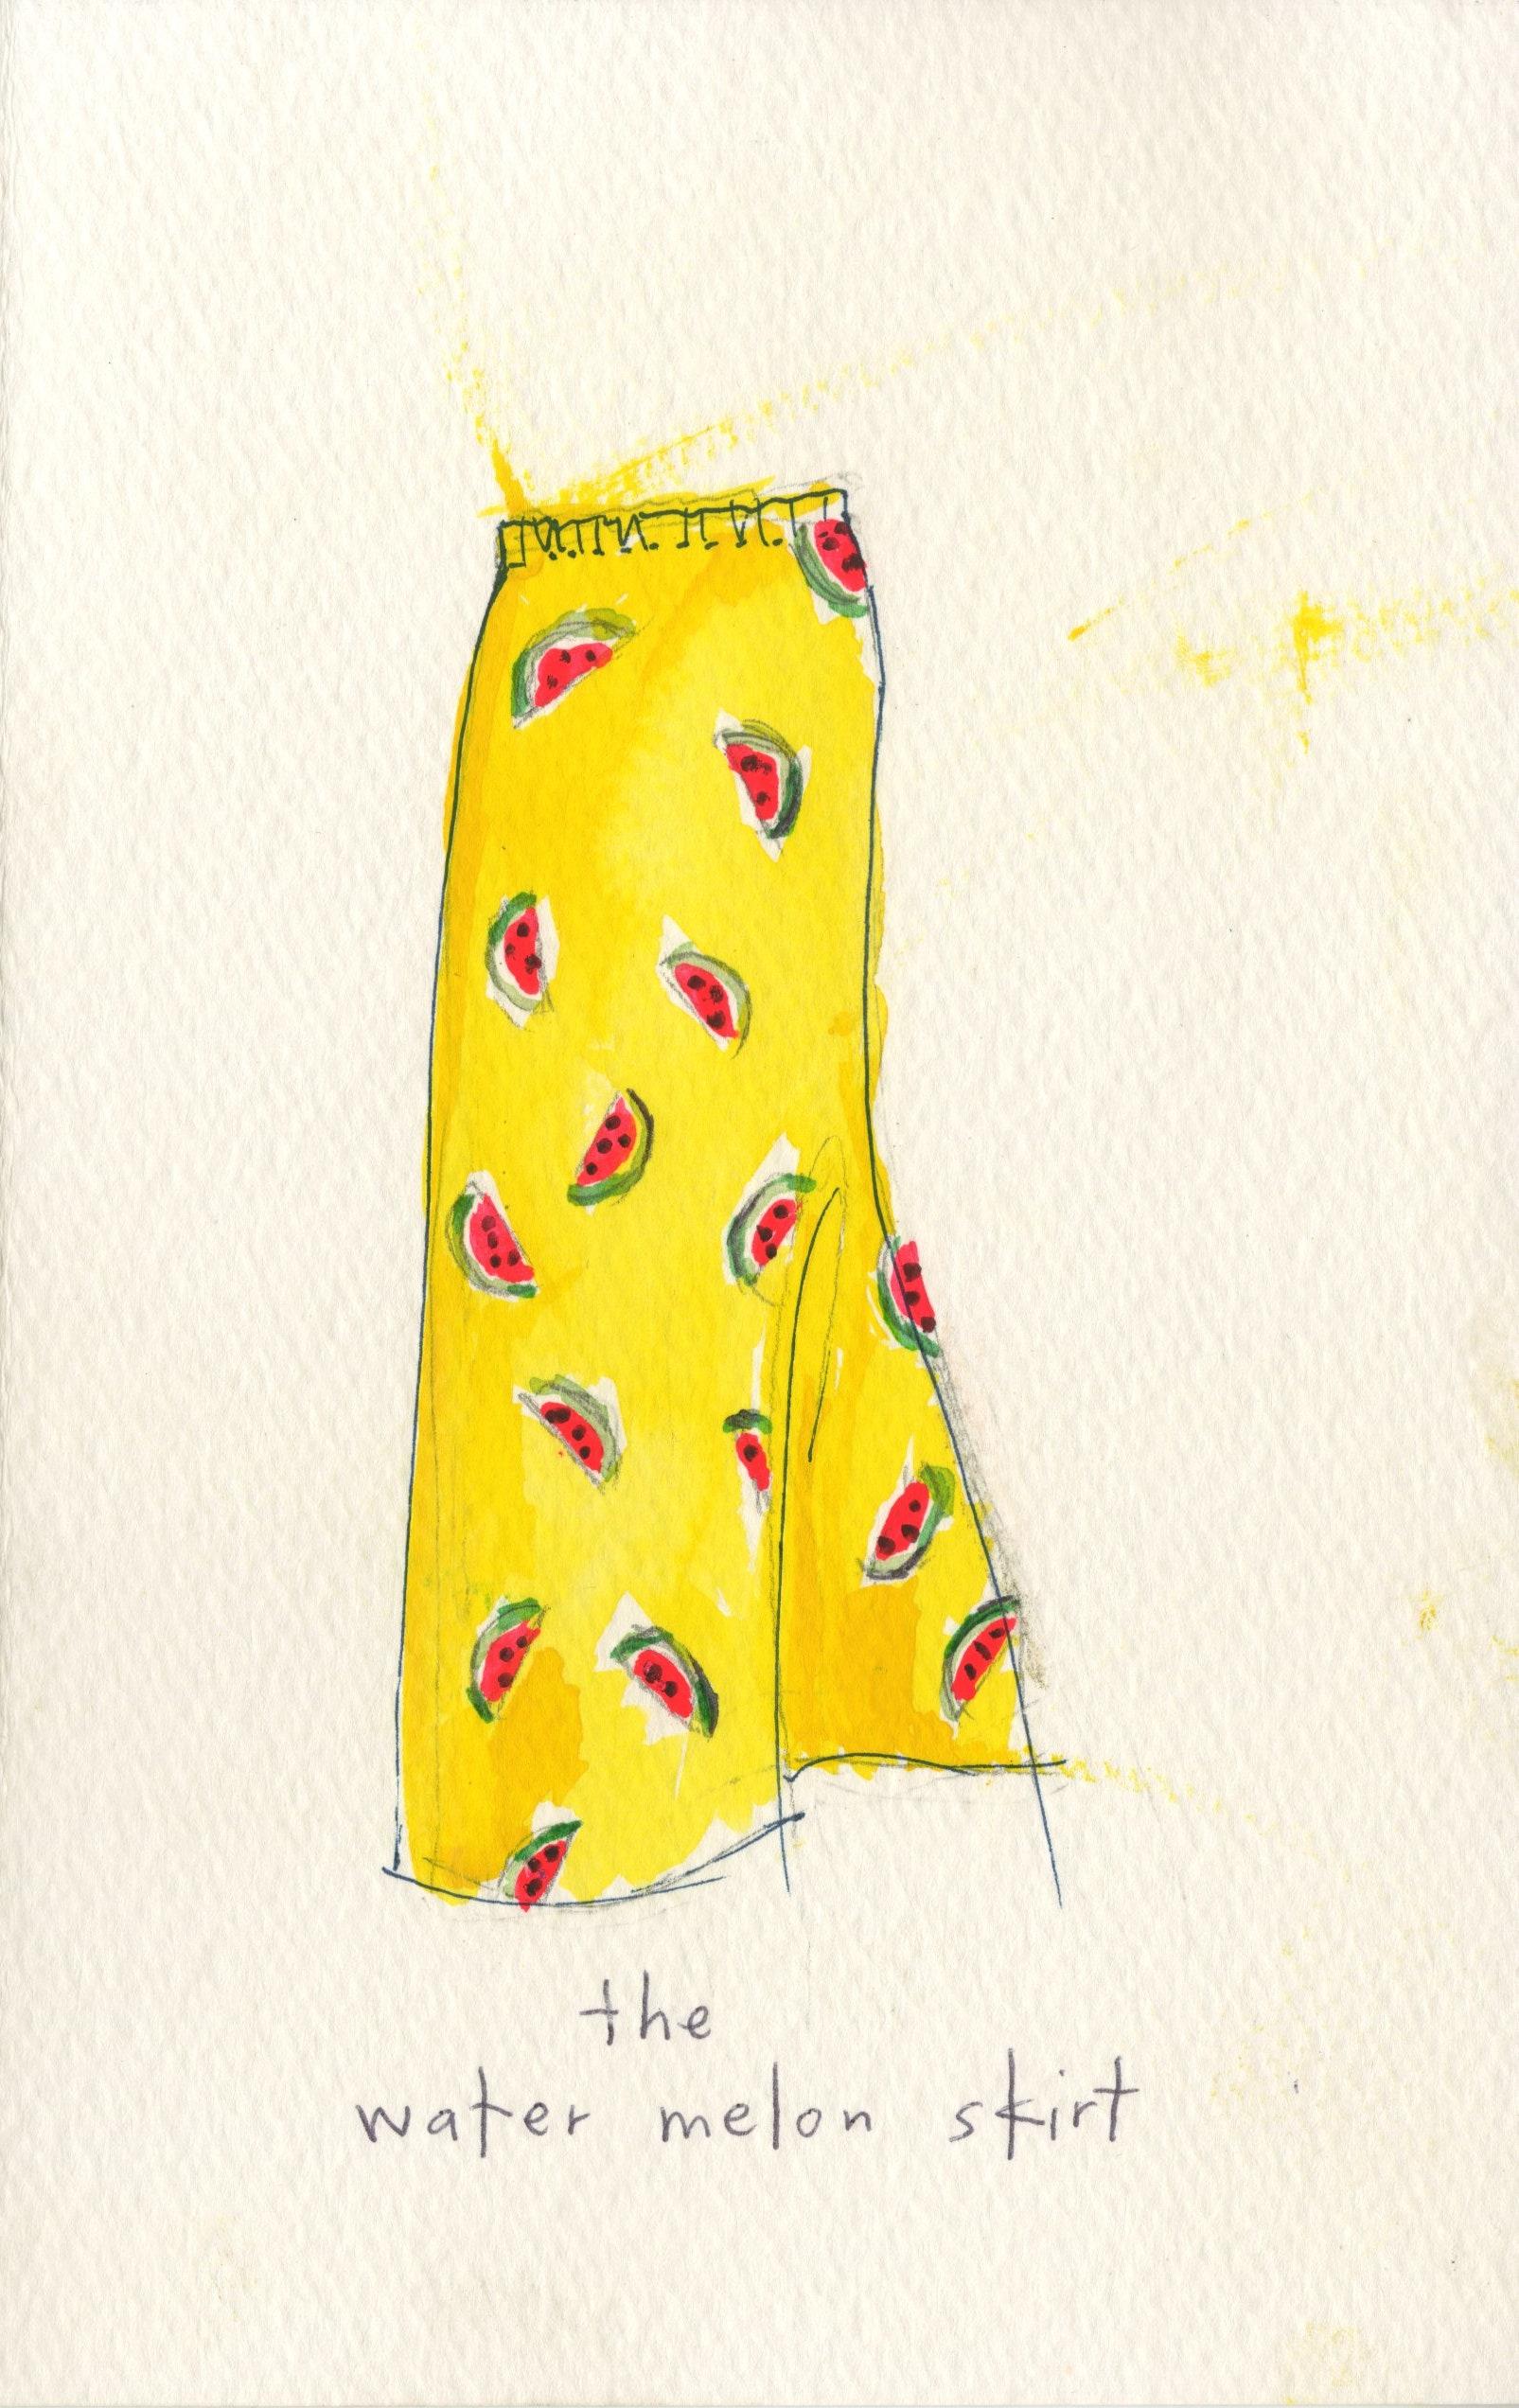 The Watermelon Skirt